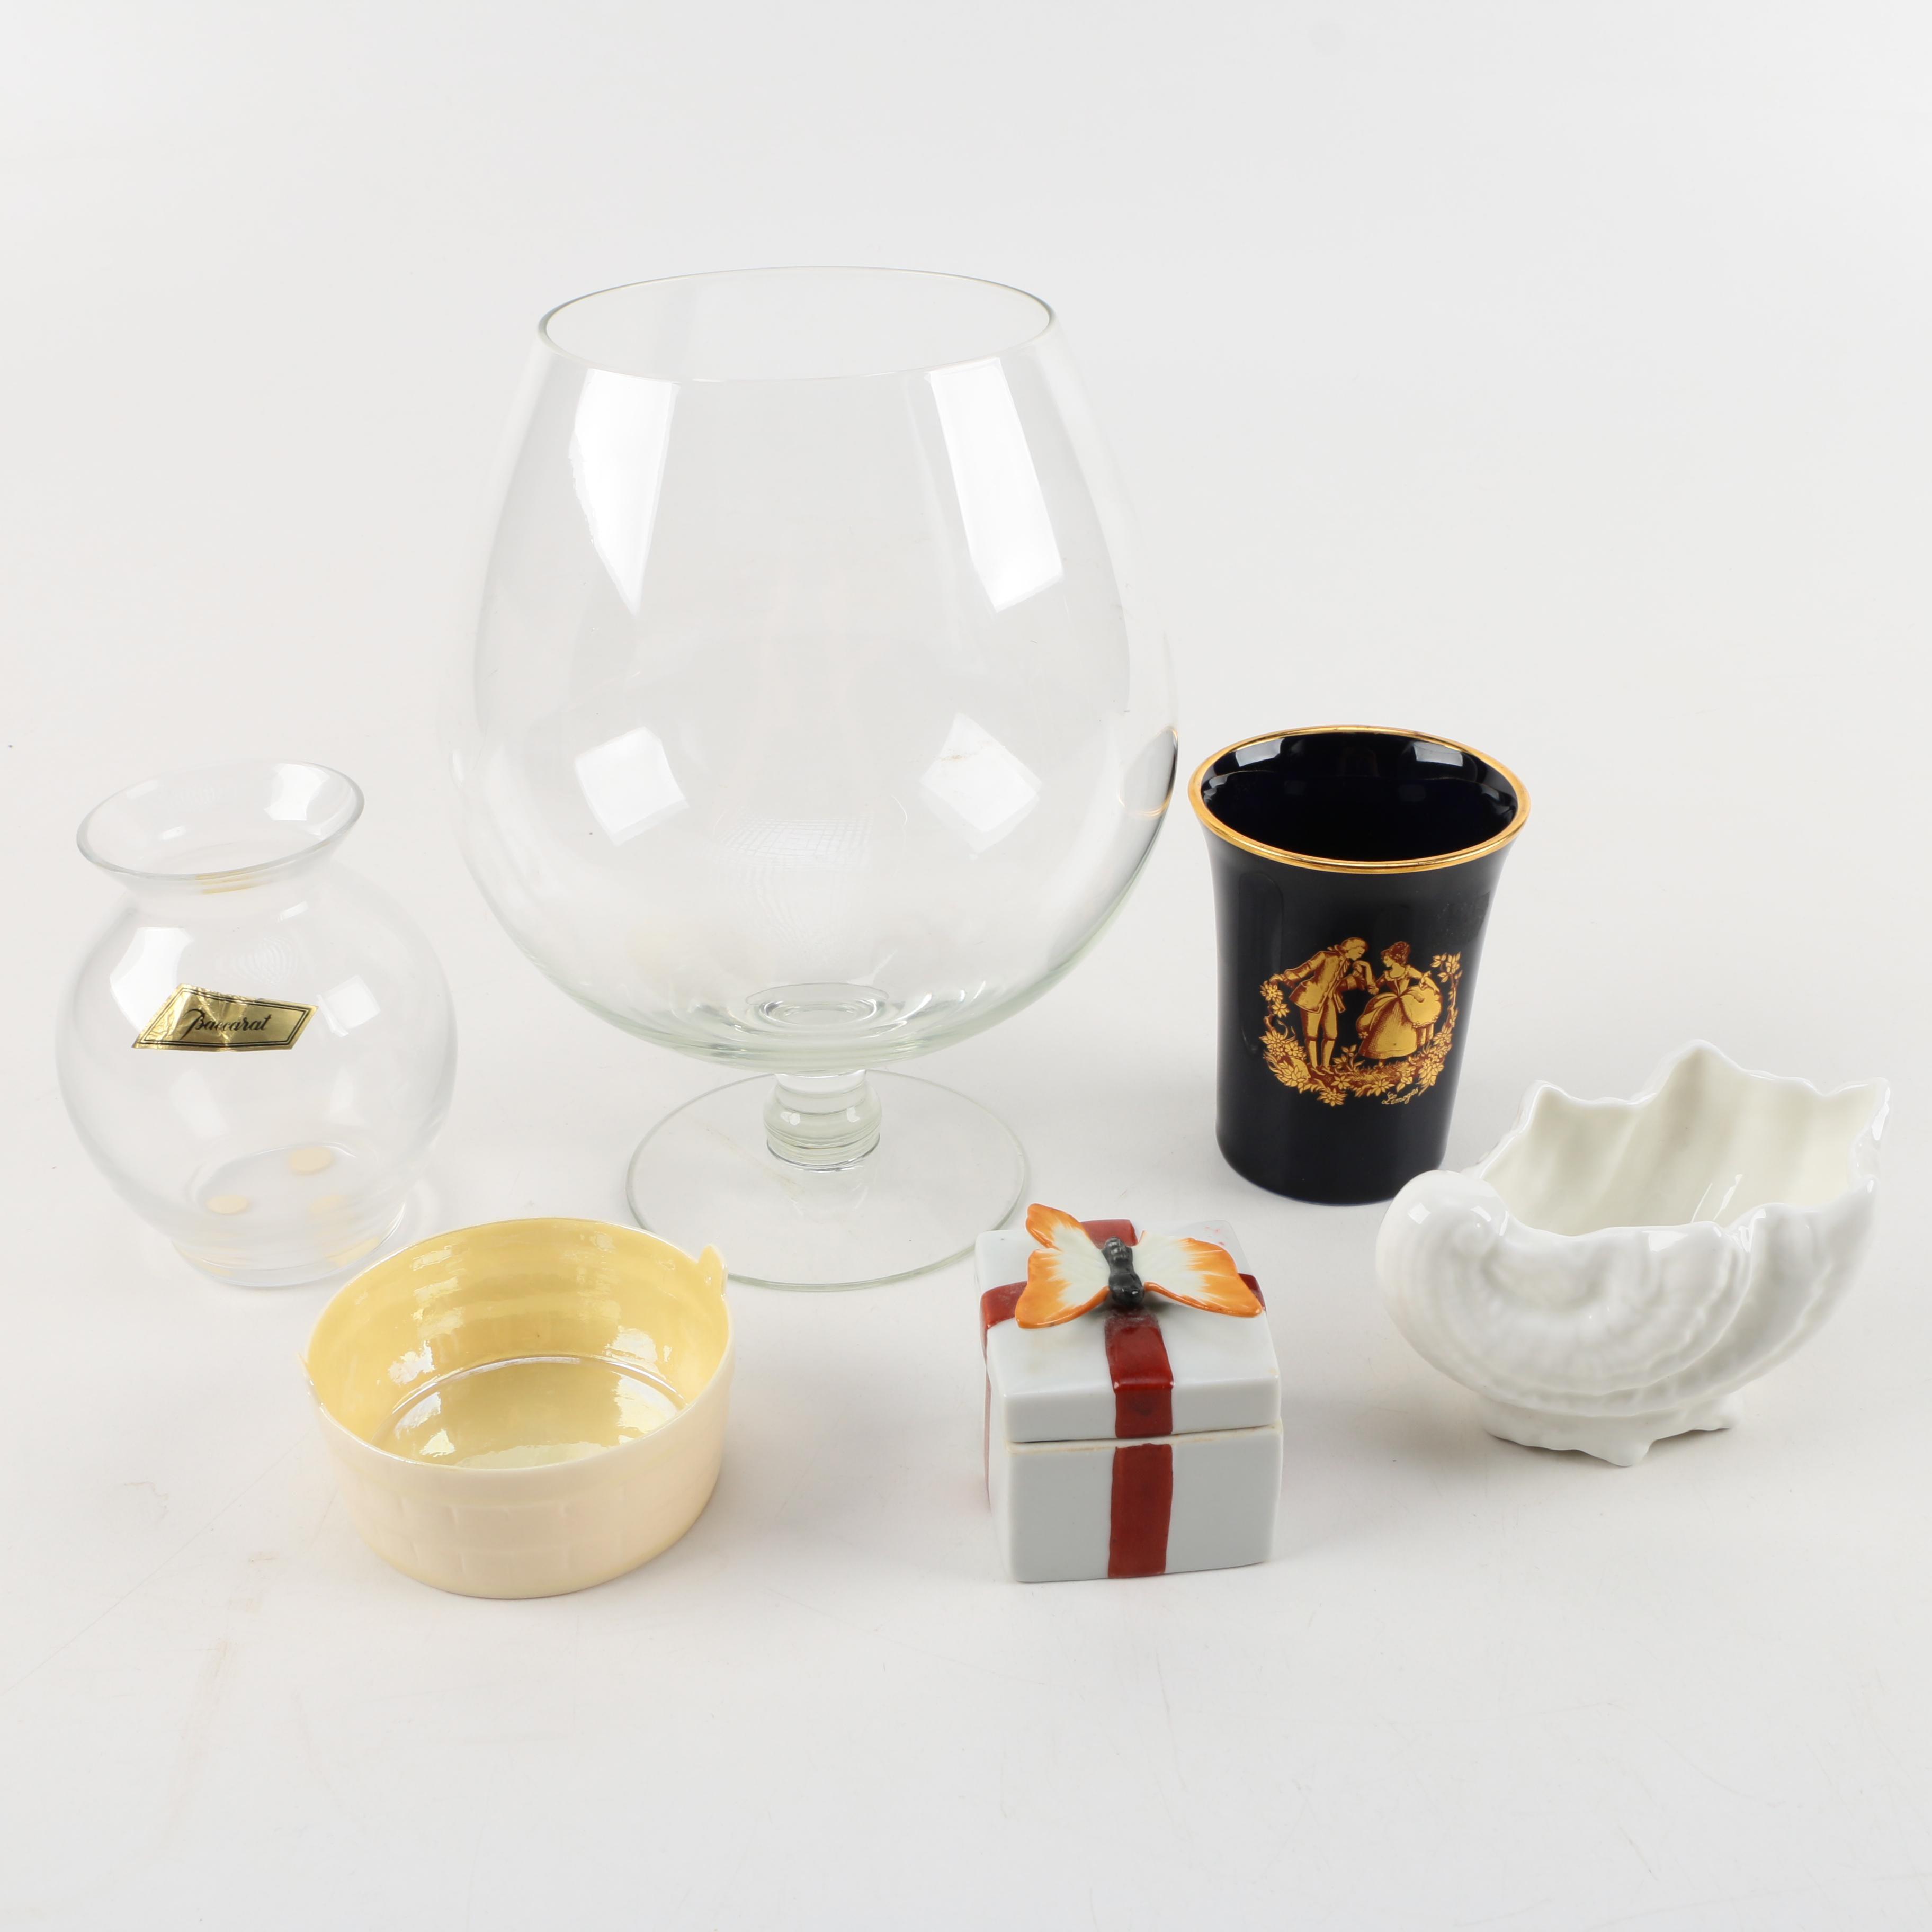 Limoges Castel Porcelain Cup and Other Decorative Homewares